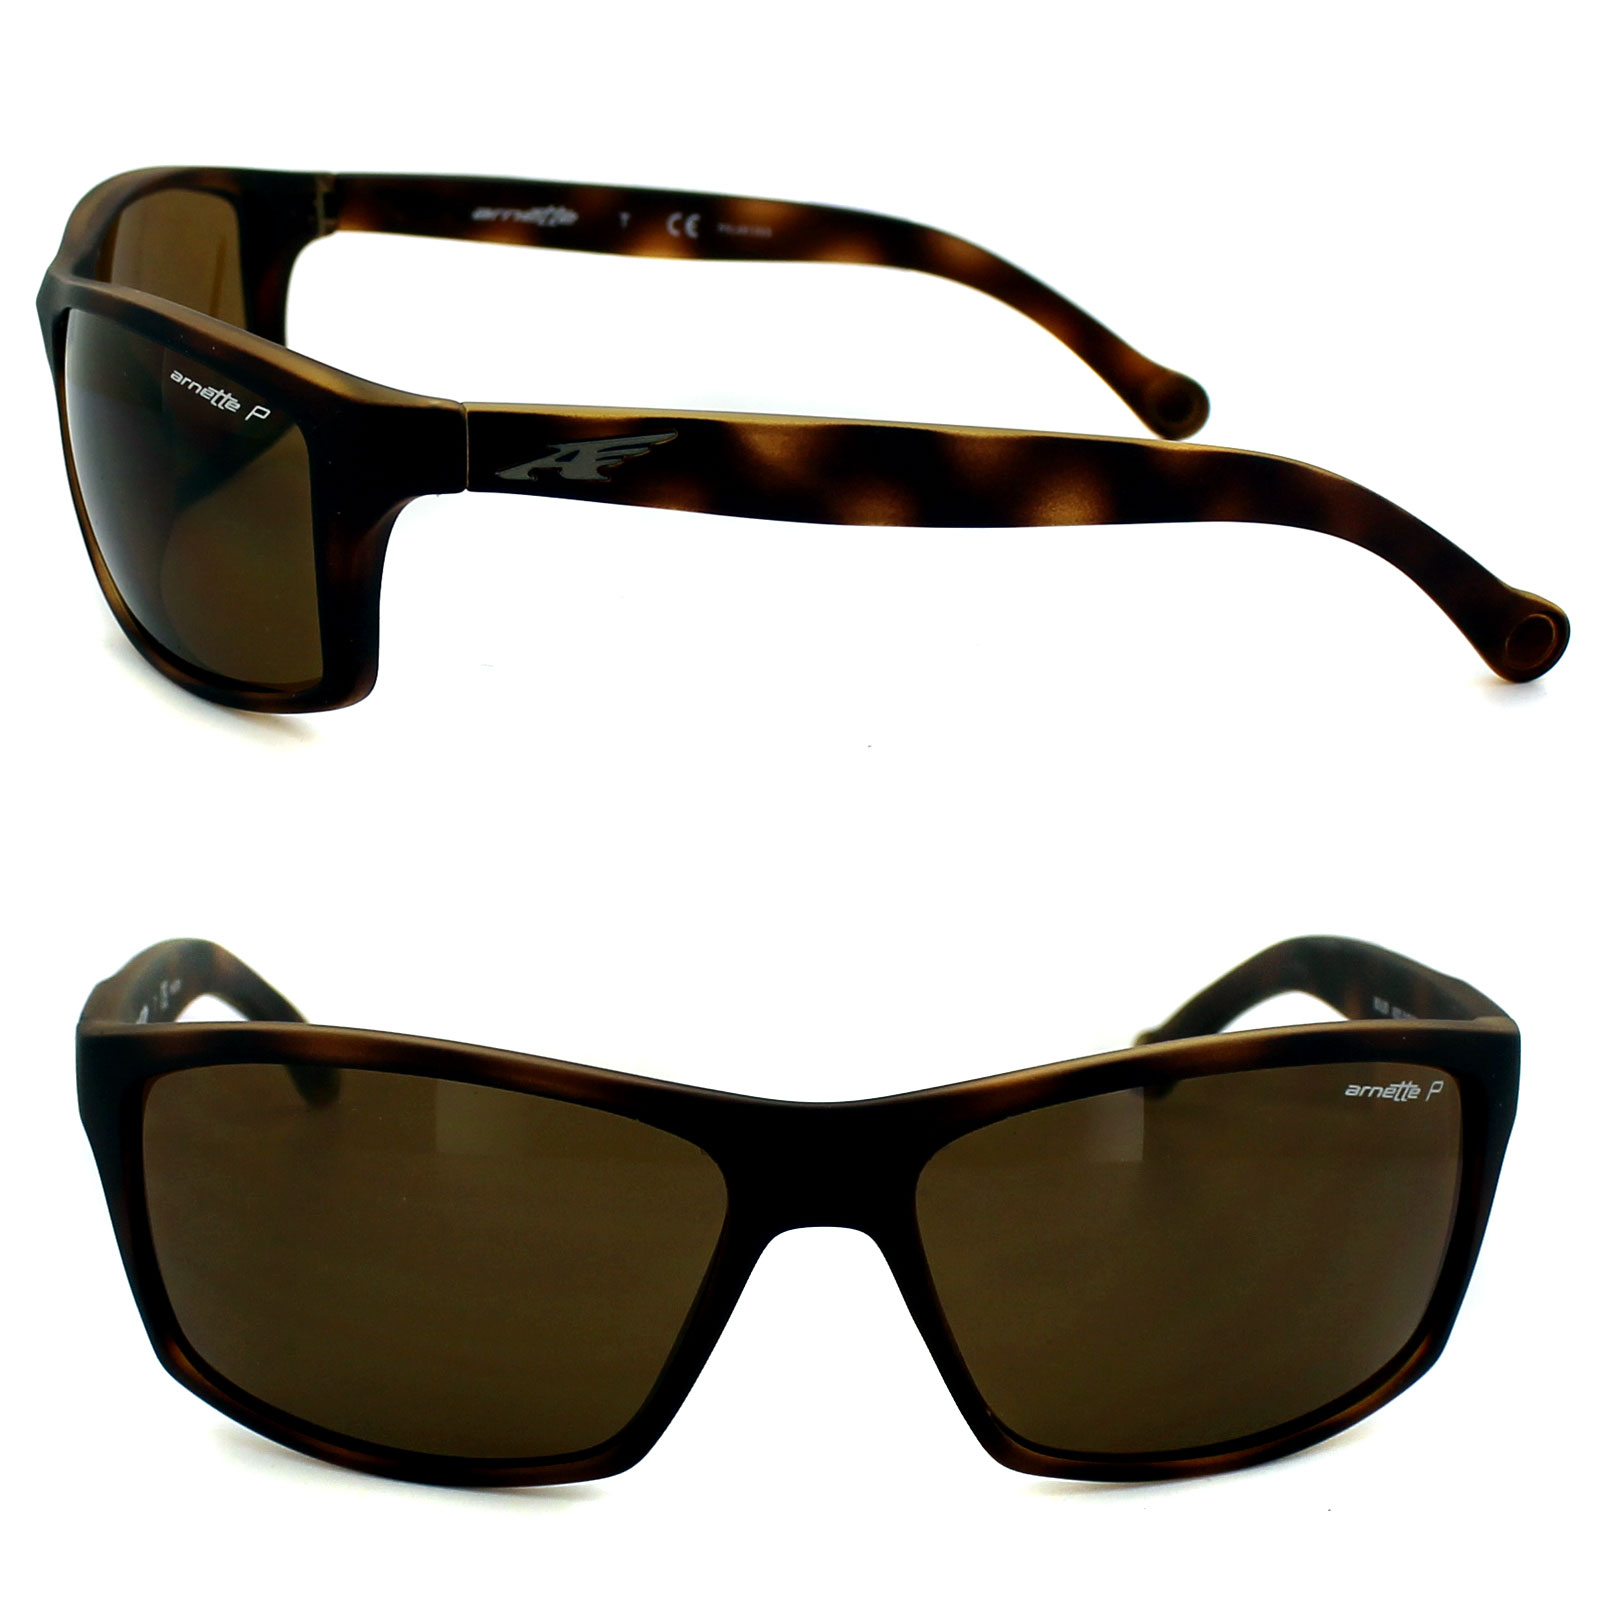 4758148b3a6 Sentinel Arnette Sunglasses 4207 Boiler 215283 Fuzzy Havana Brown Polarized